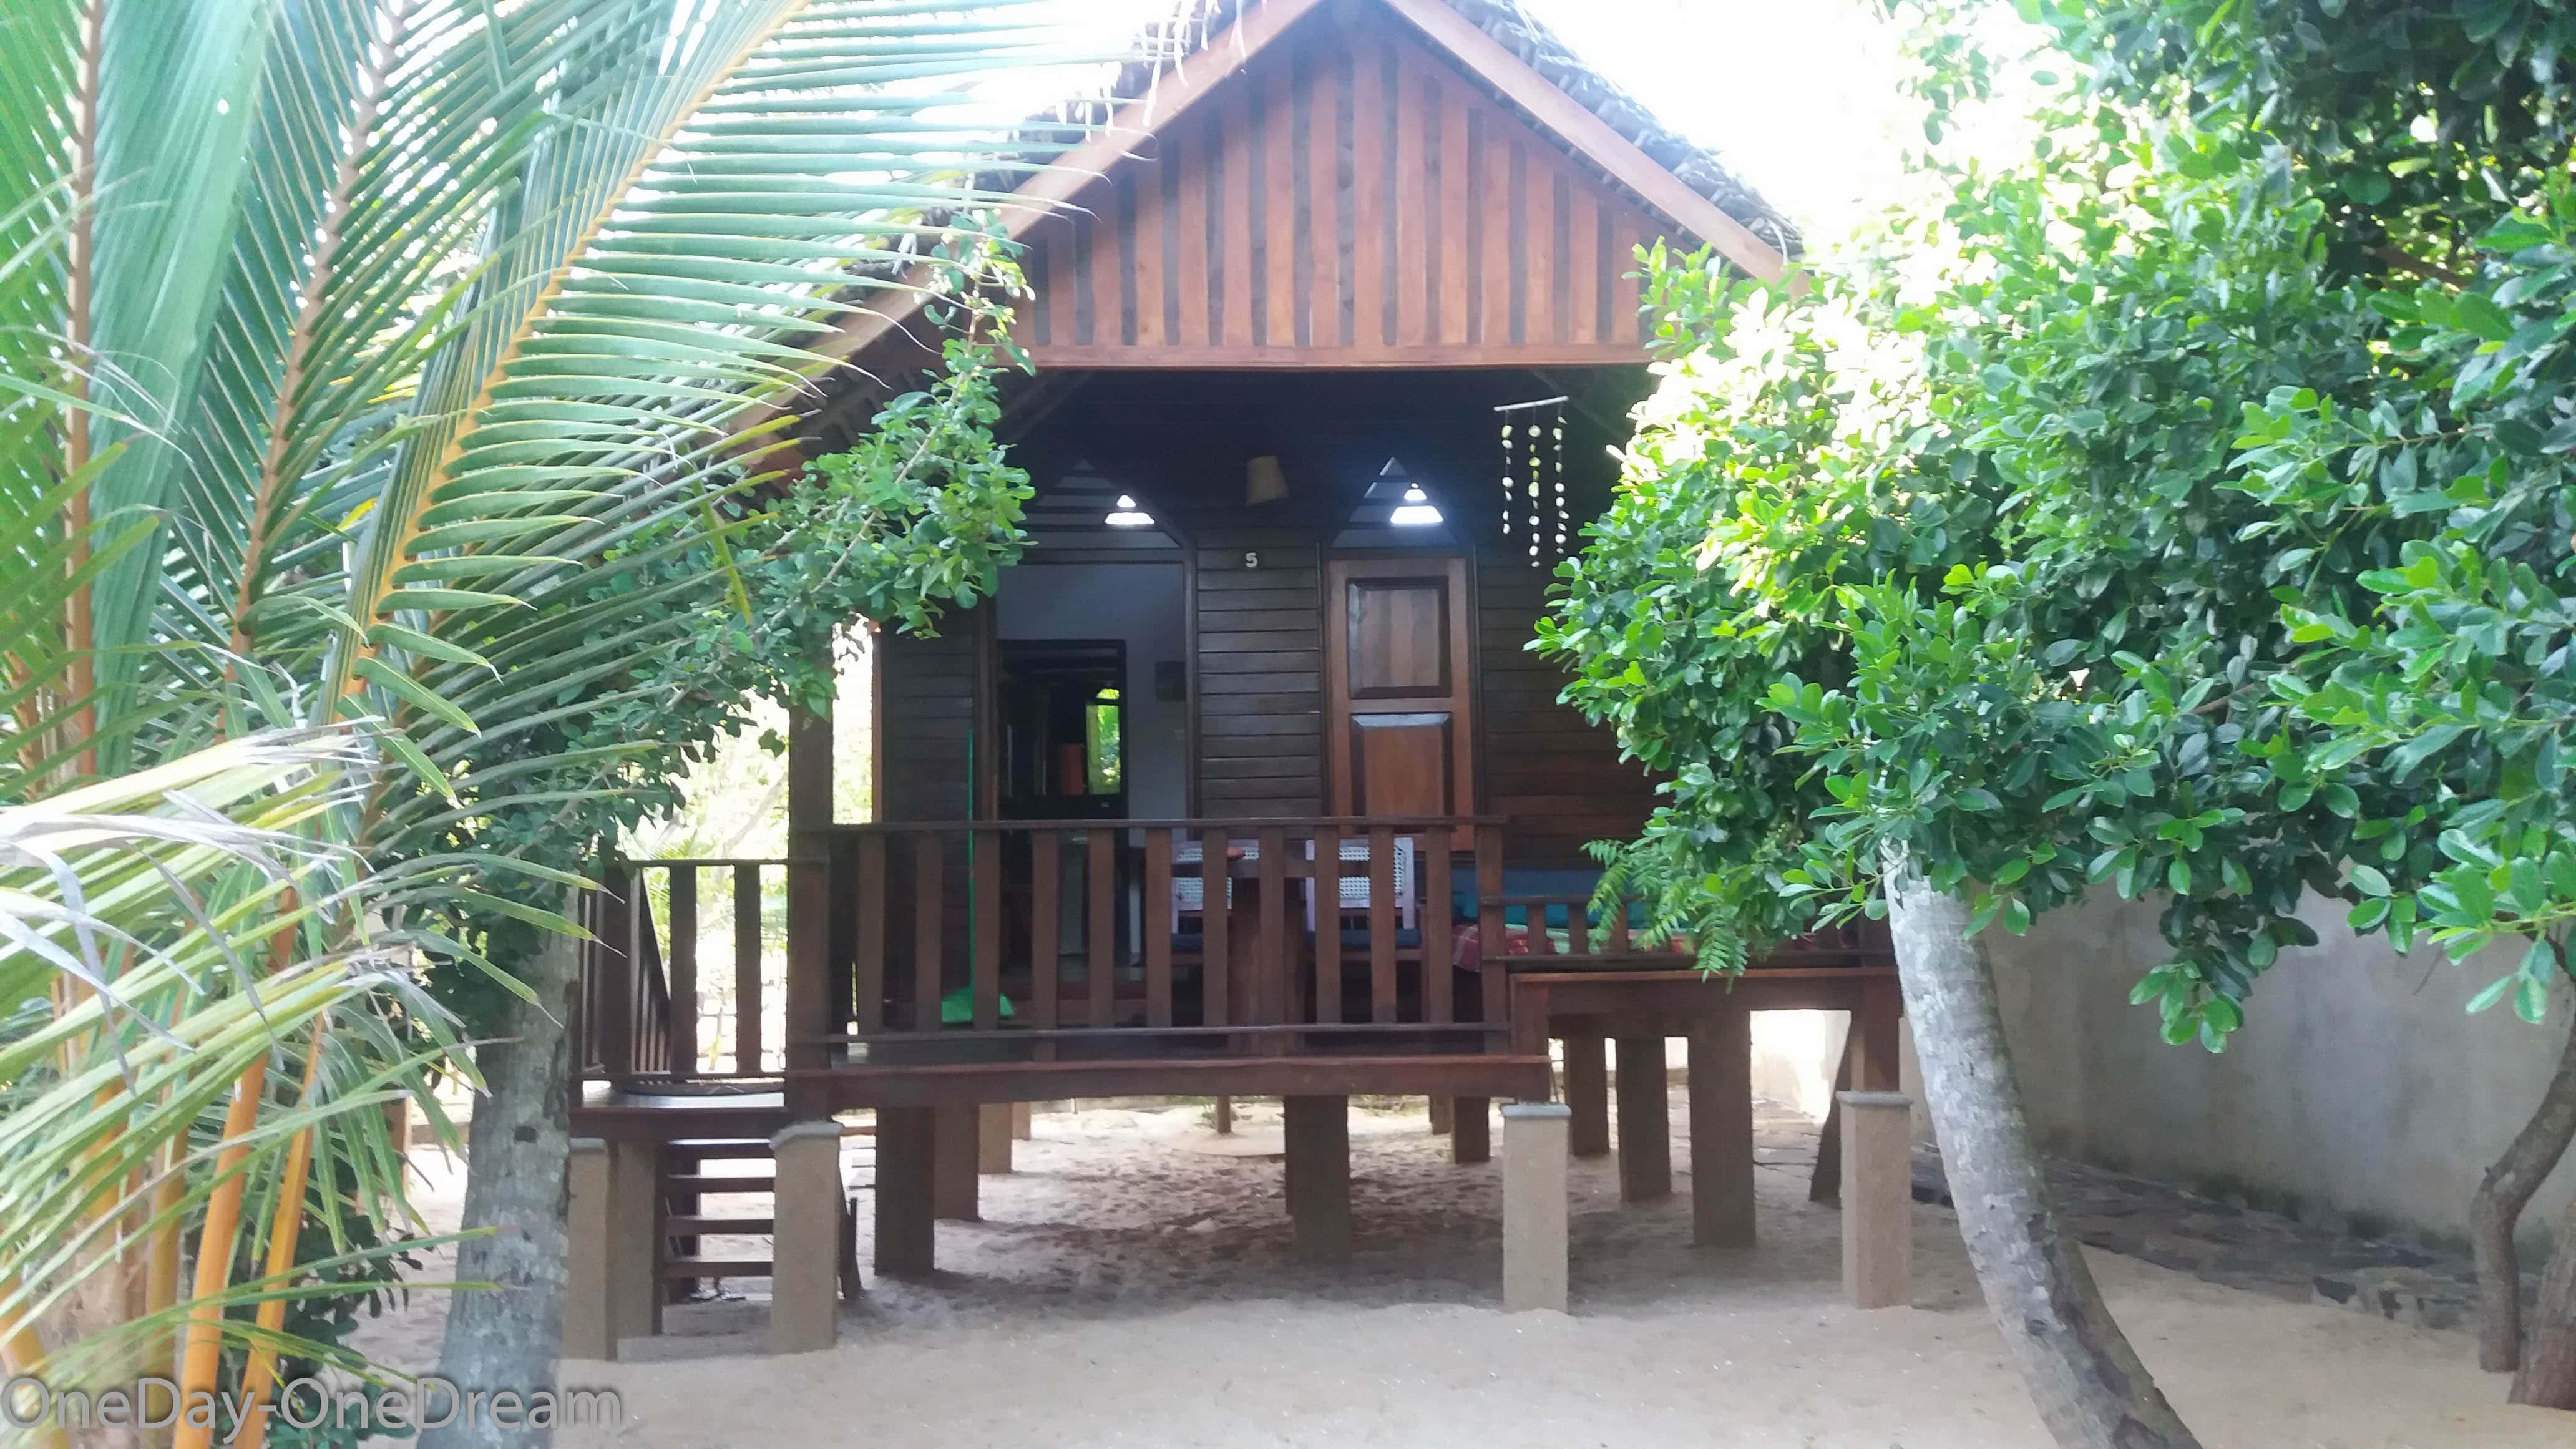 shiva-beach-cabana